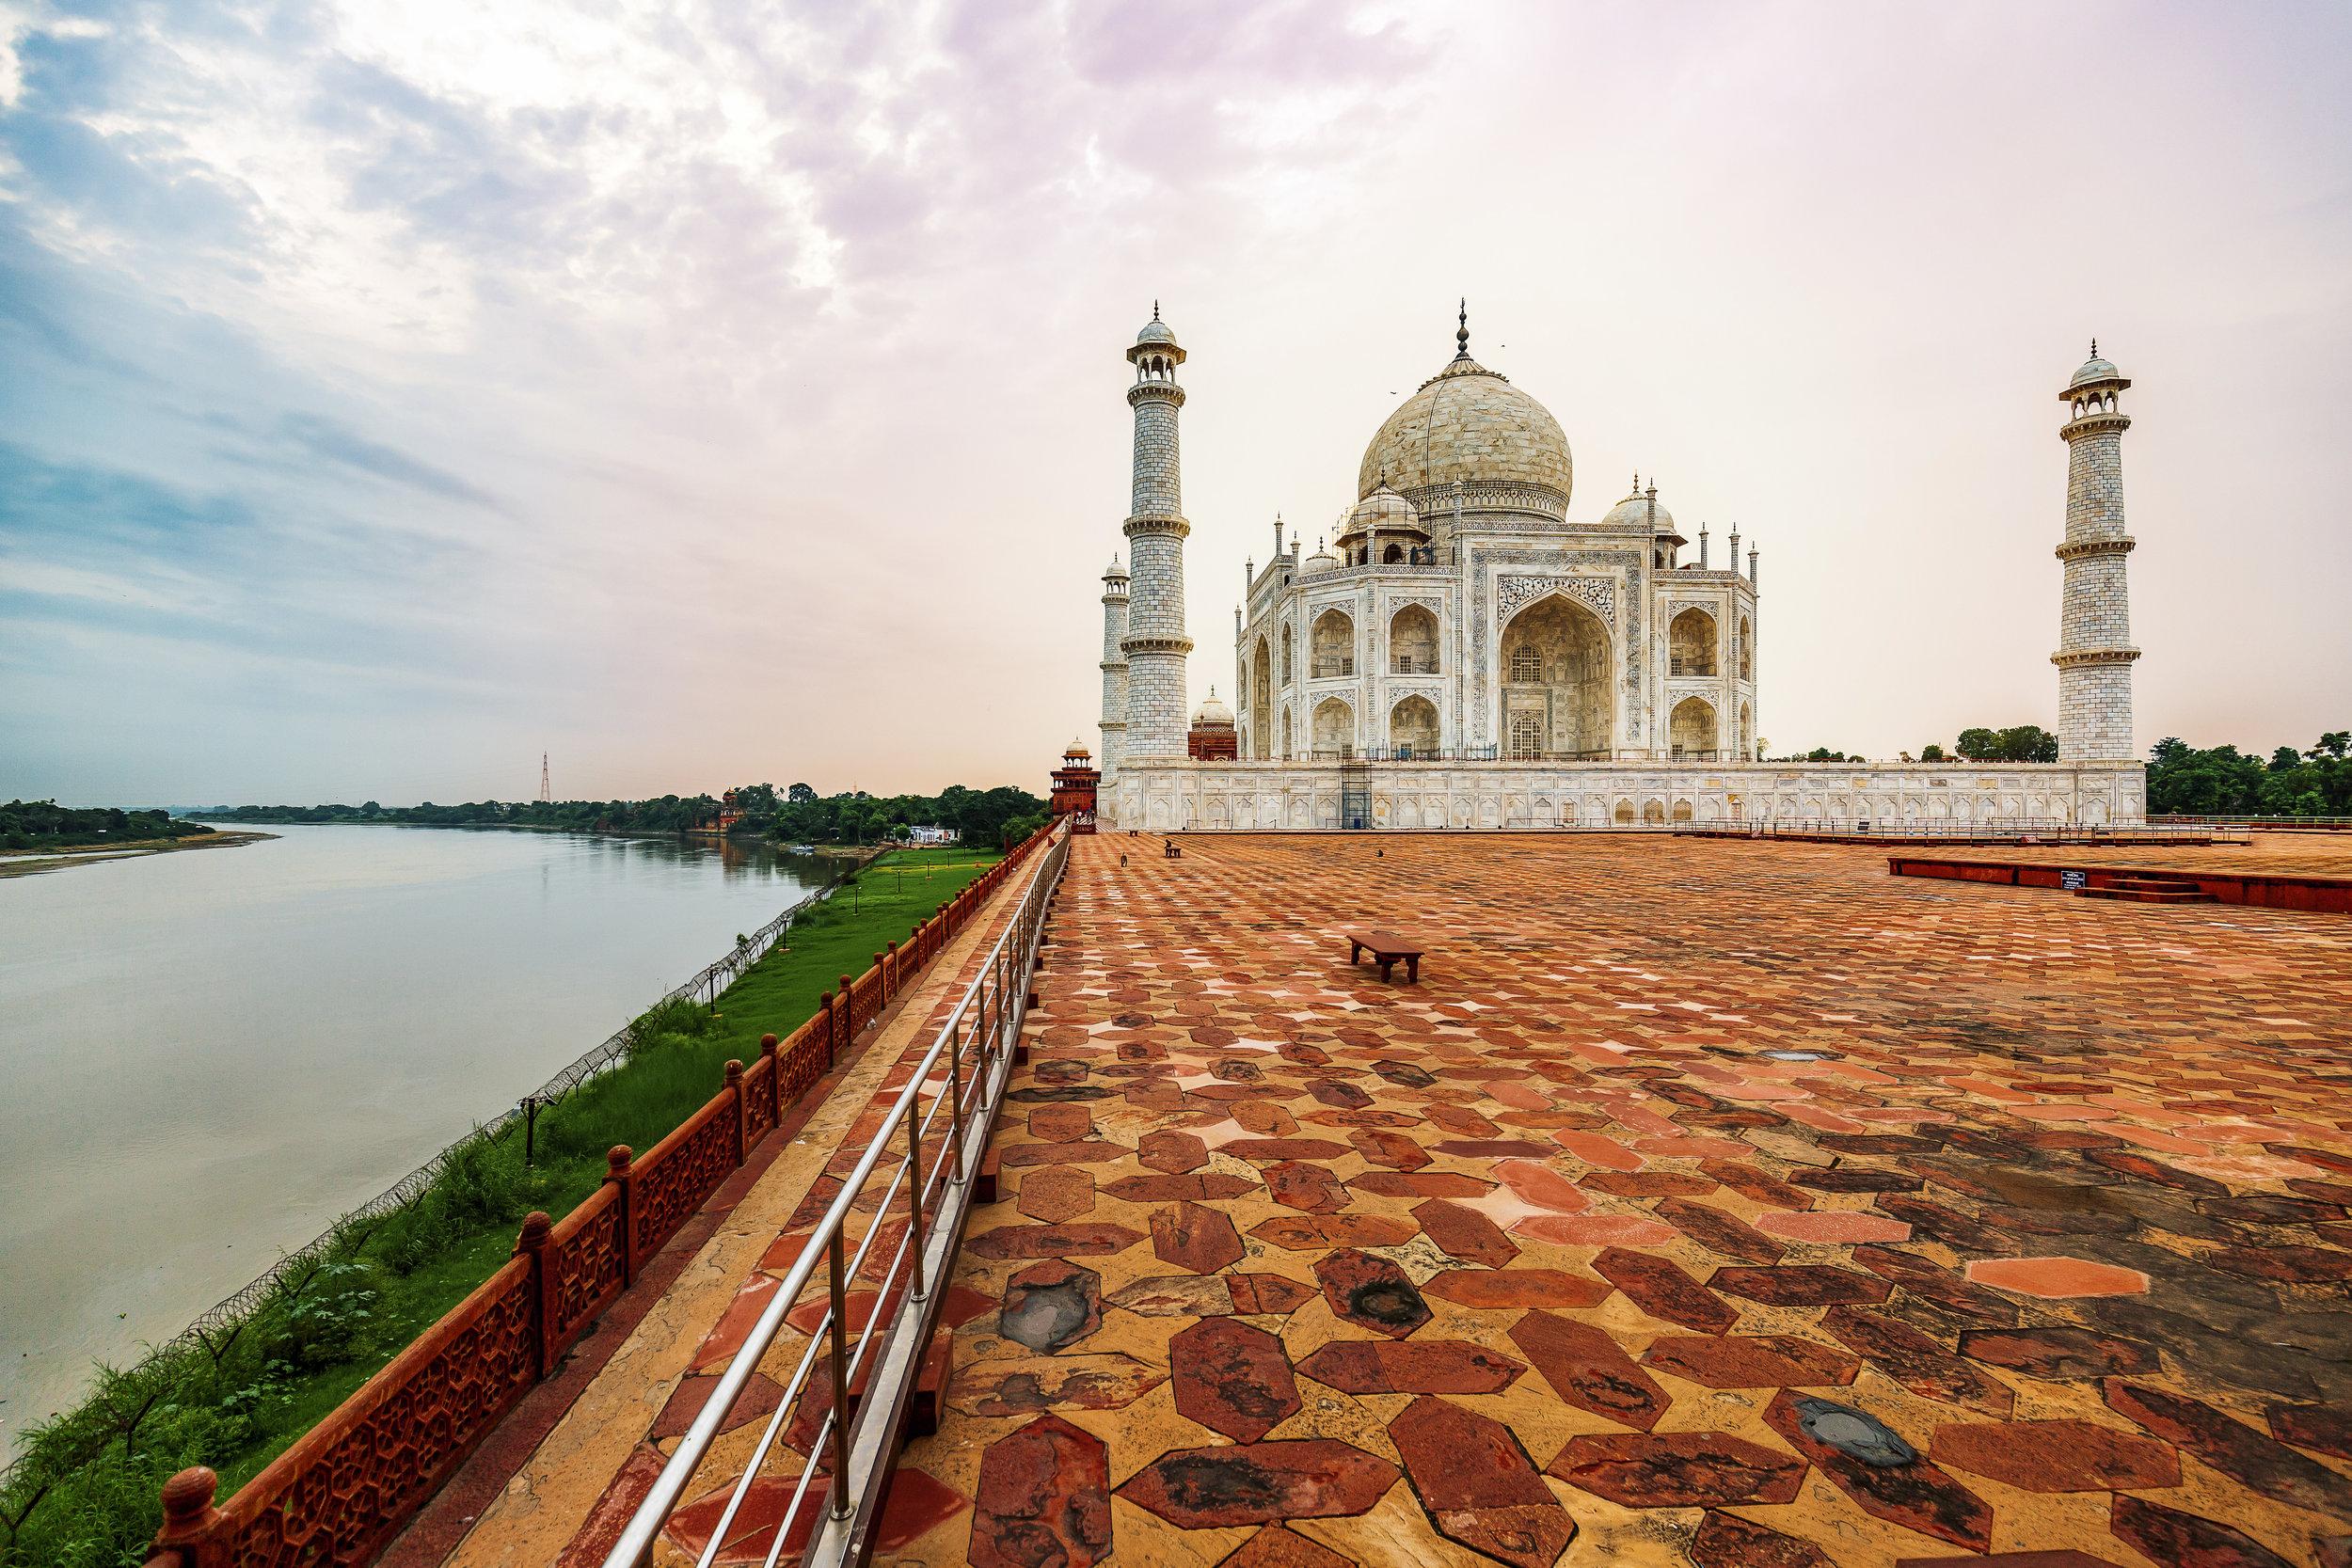 India_TajMahal_03.2.jpg